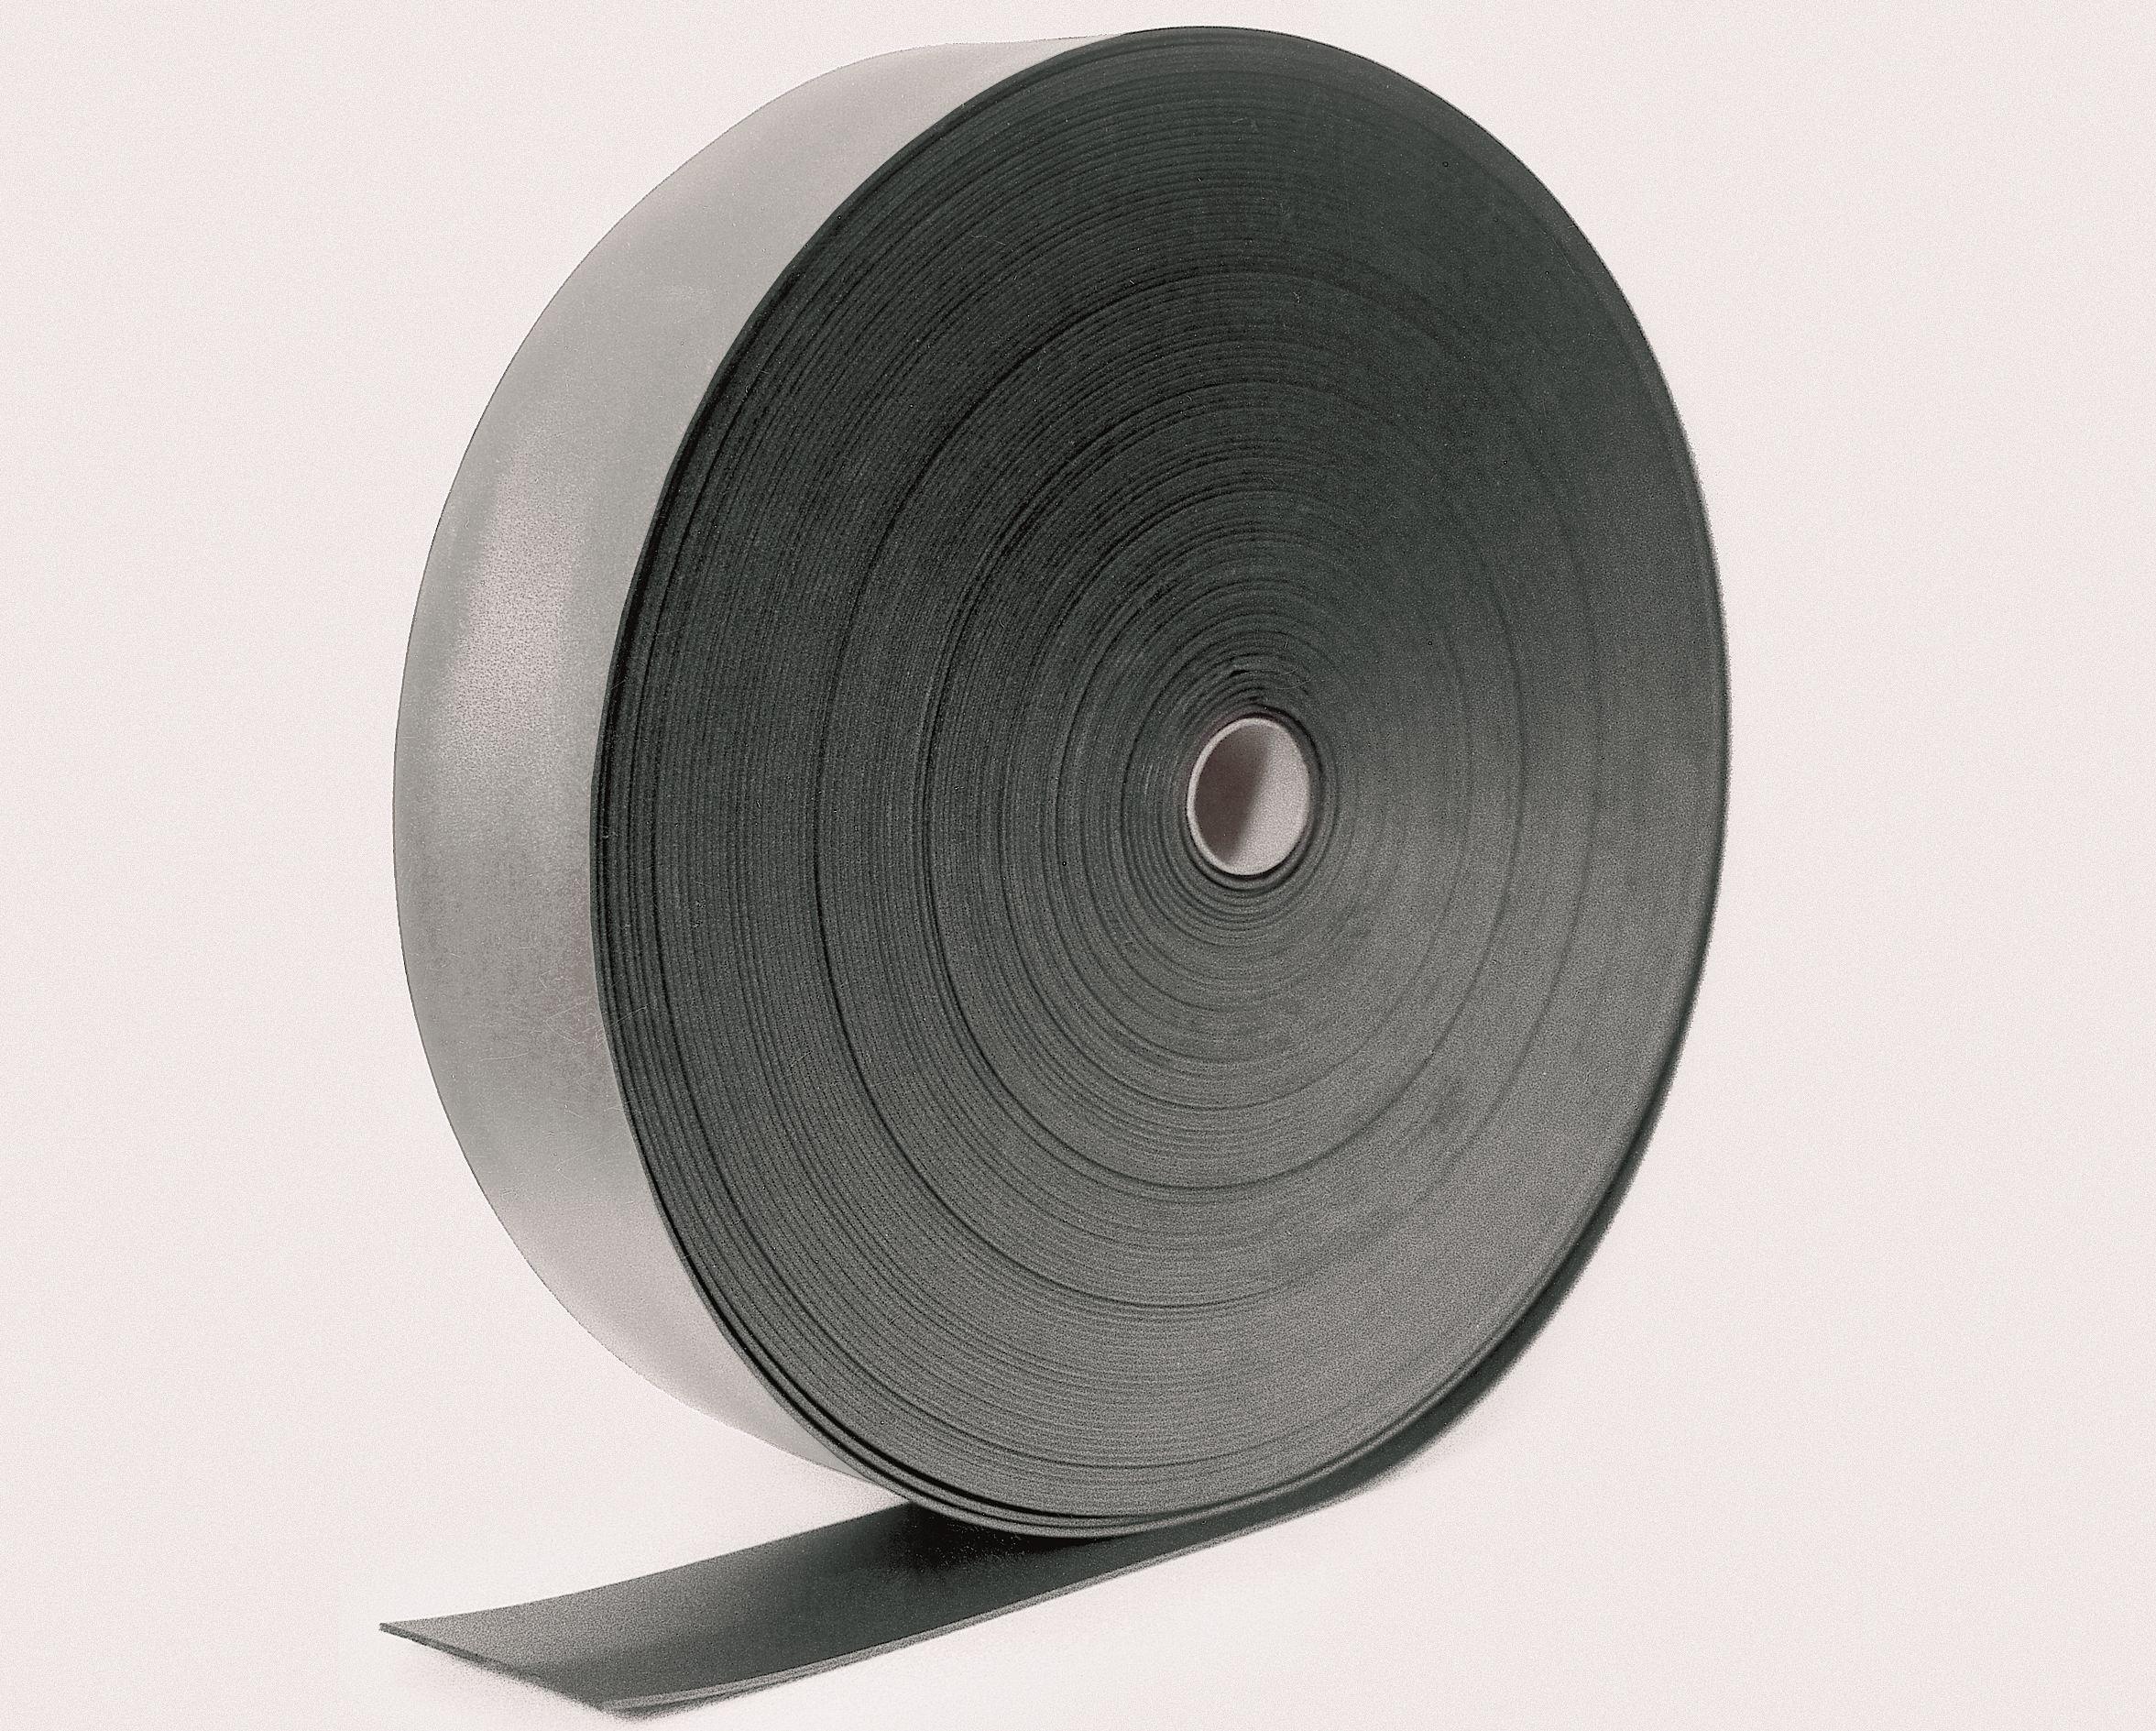 Lista Polietilene espanso adesivo